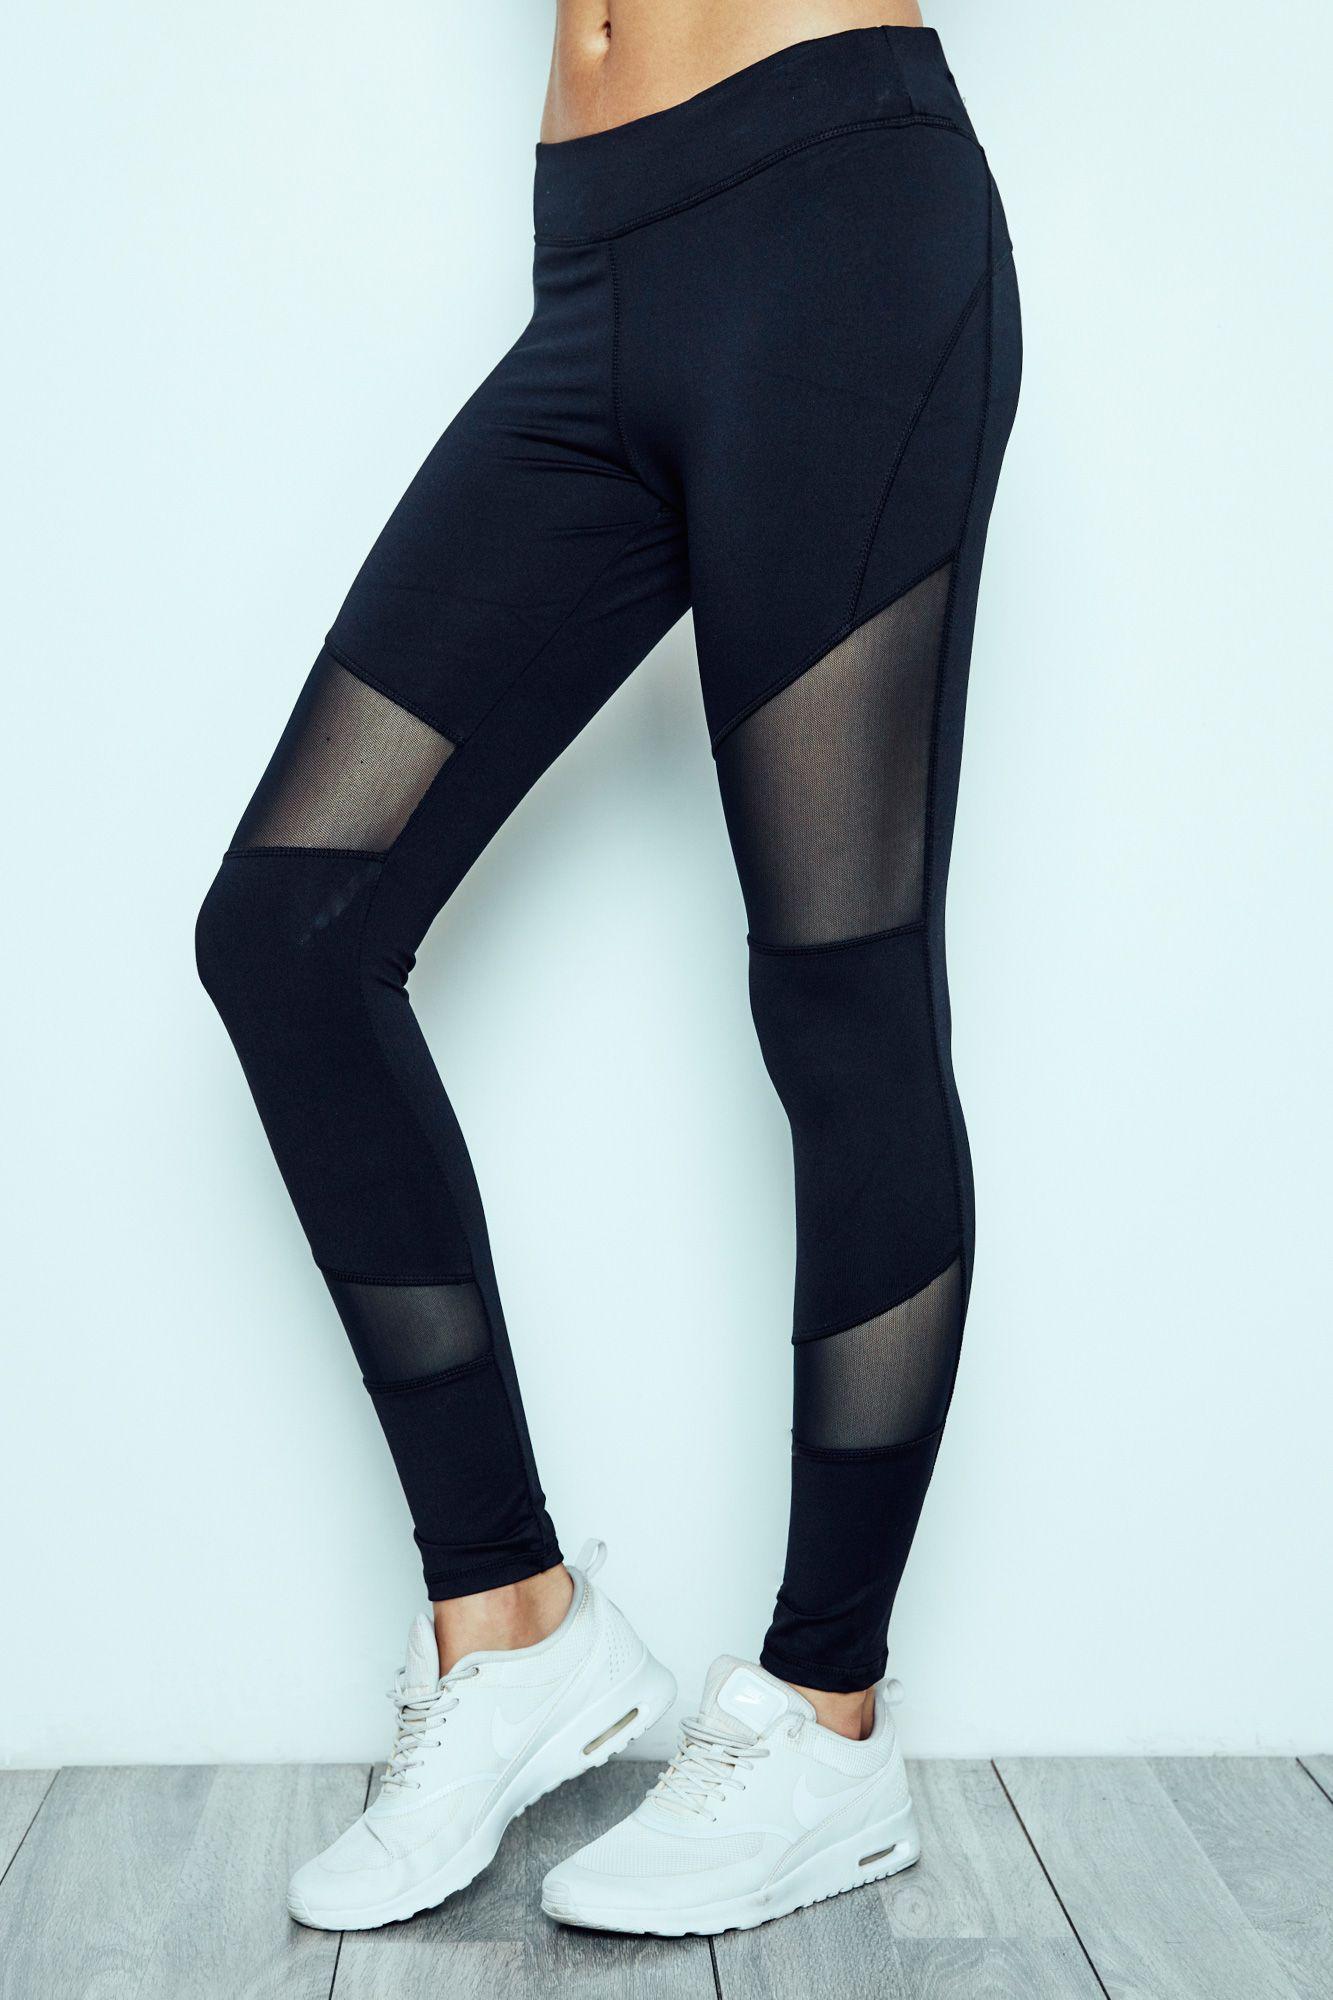 Mesh Panel Energy Legging Fashion, Urban Fitness